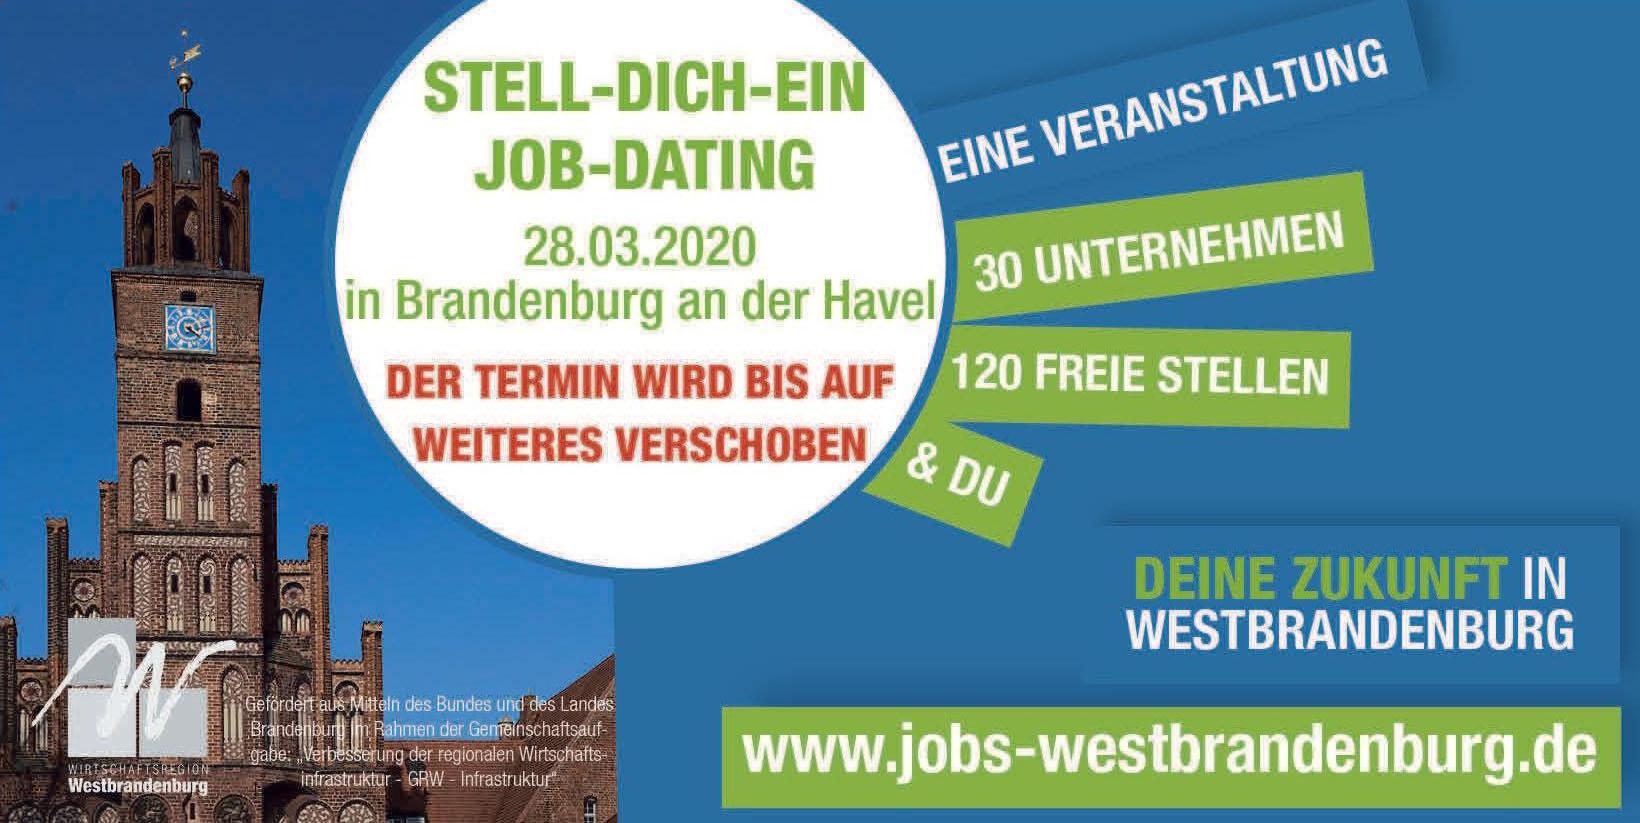 Jobs Westbrandenburg